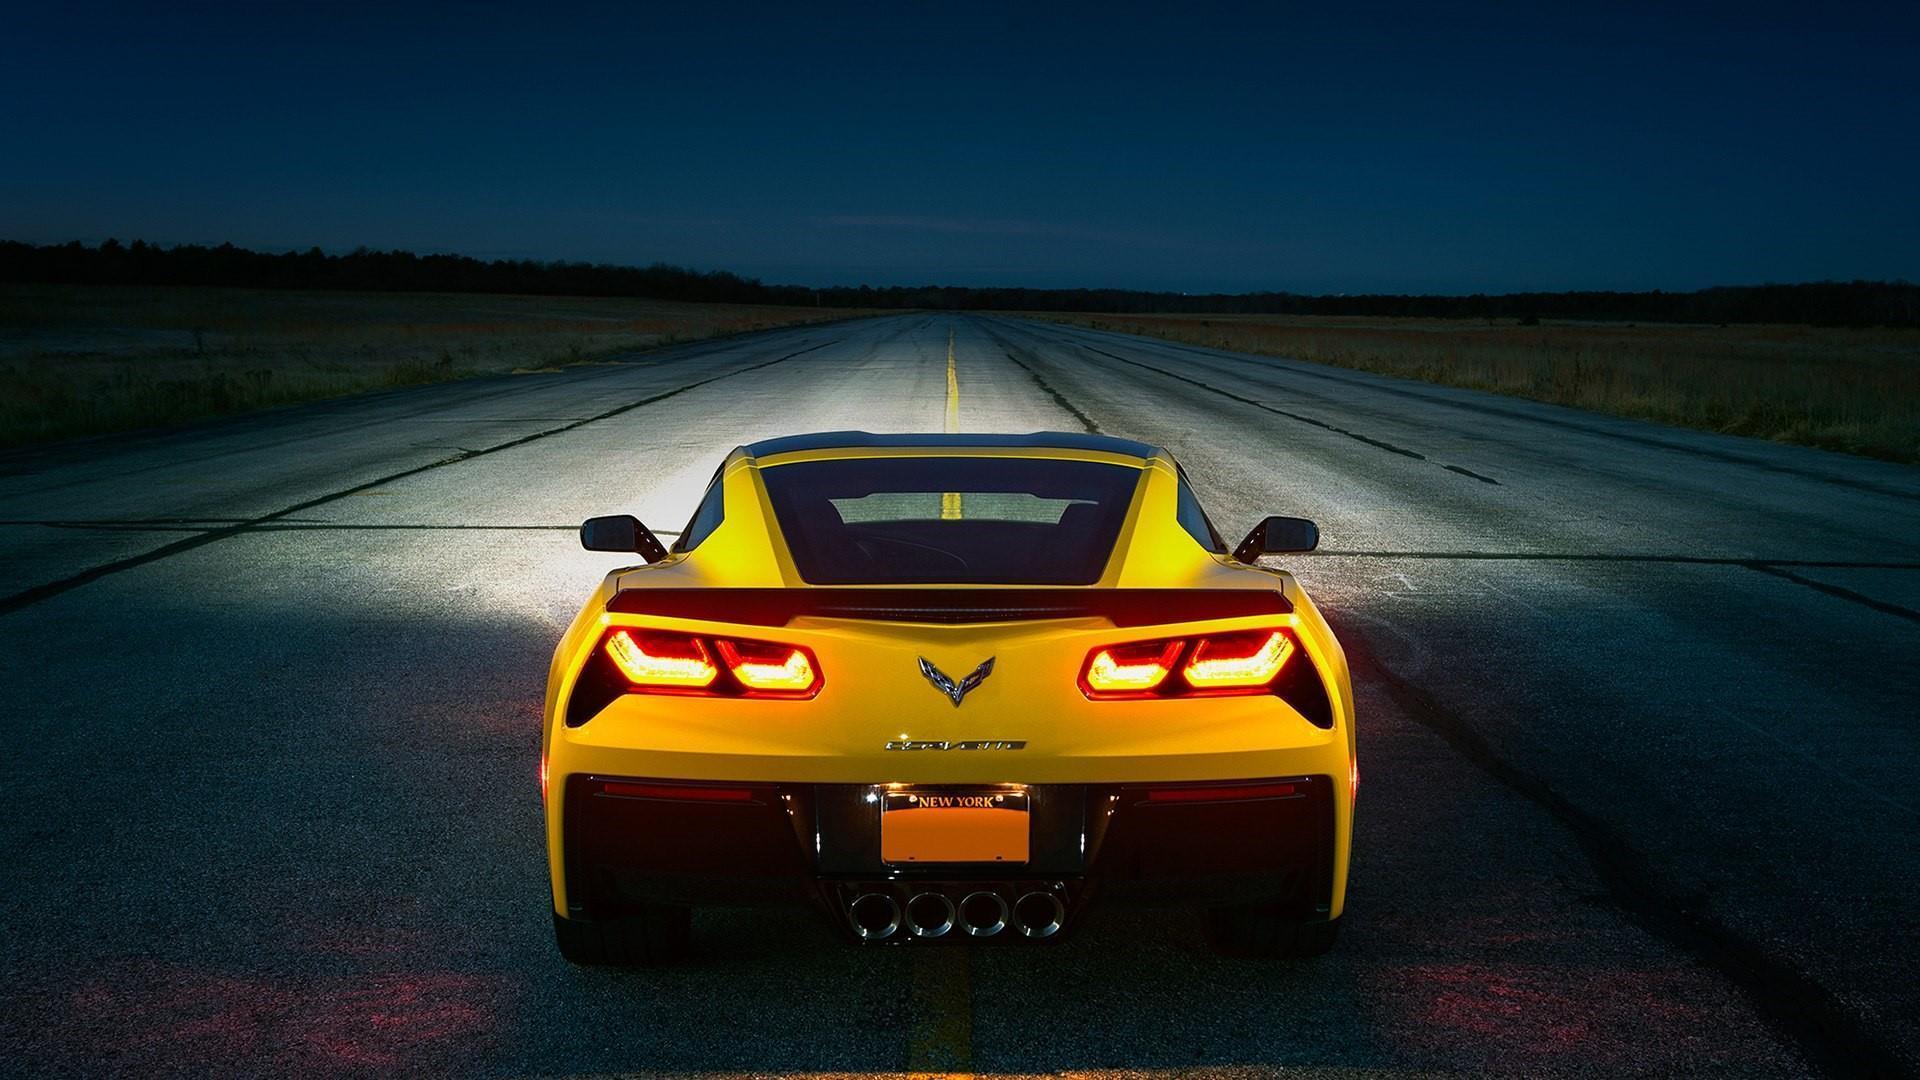 "4096x2304 2019 Chevrolet Corvette ZR1 4K 4 Wallpaper | HD Car Wallpapers| ID #9059"">"